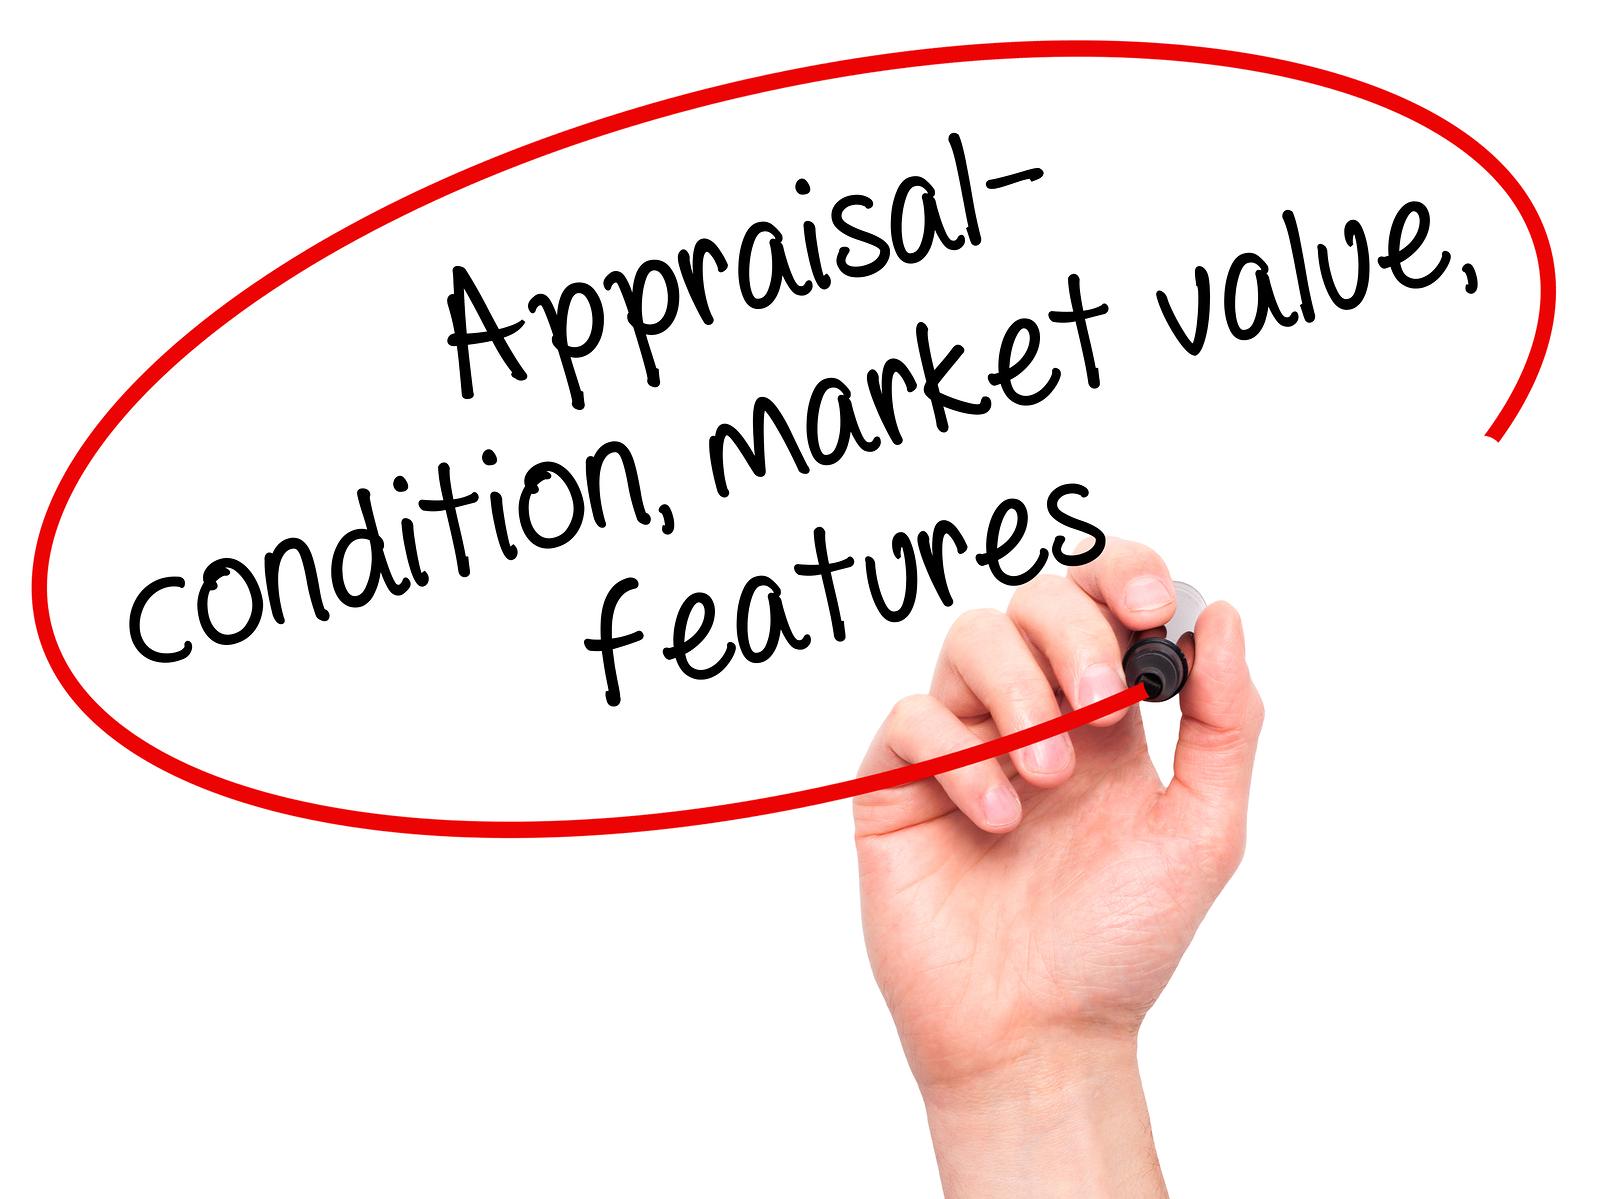 appraisal, condition, market value, features